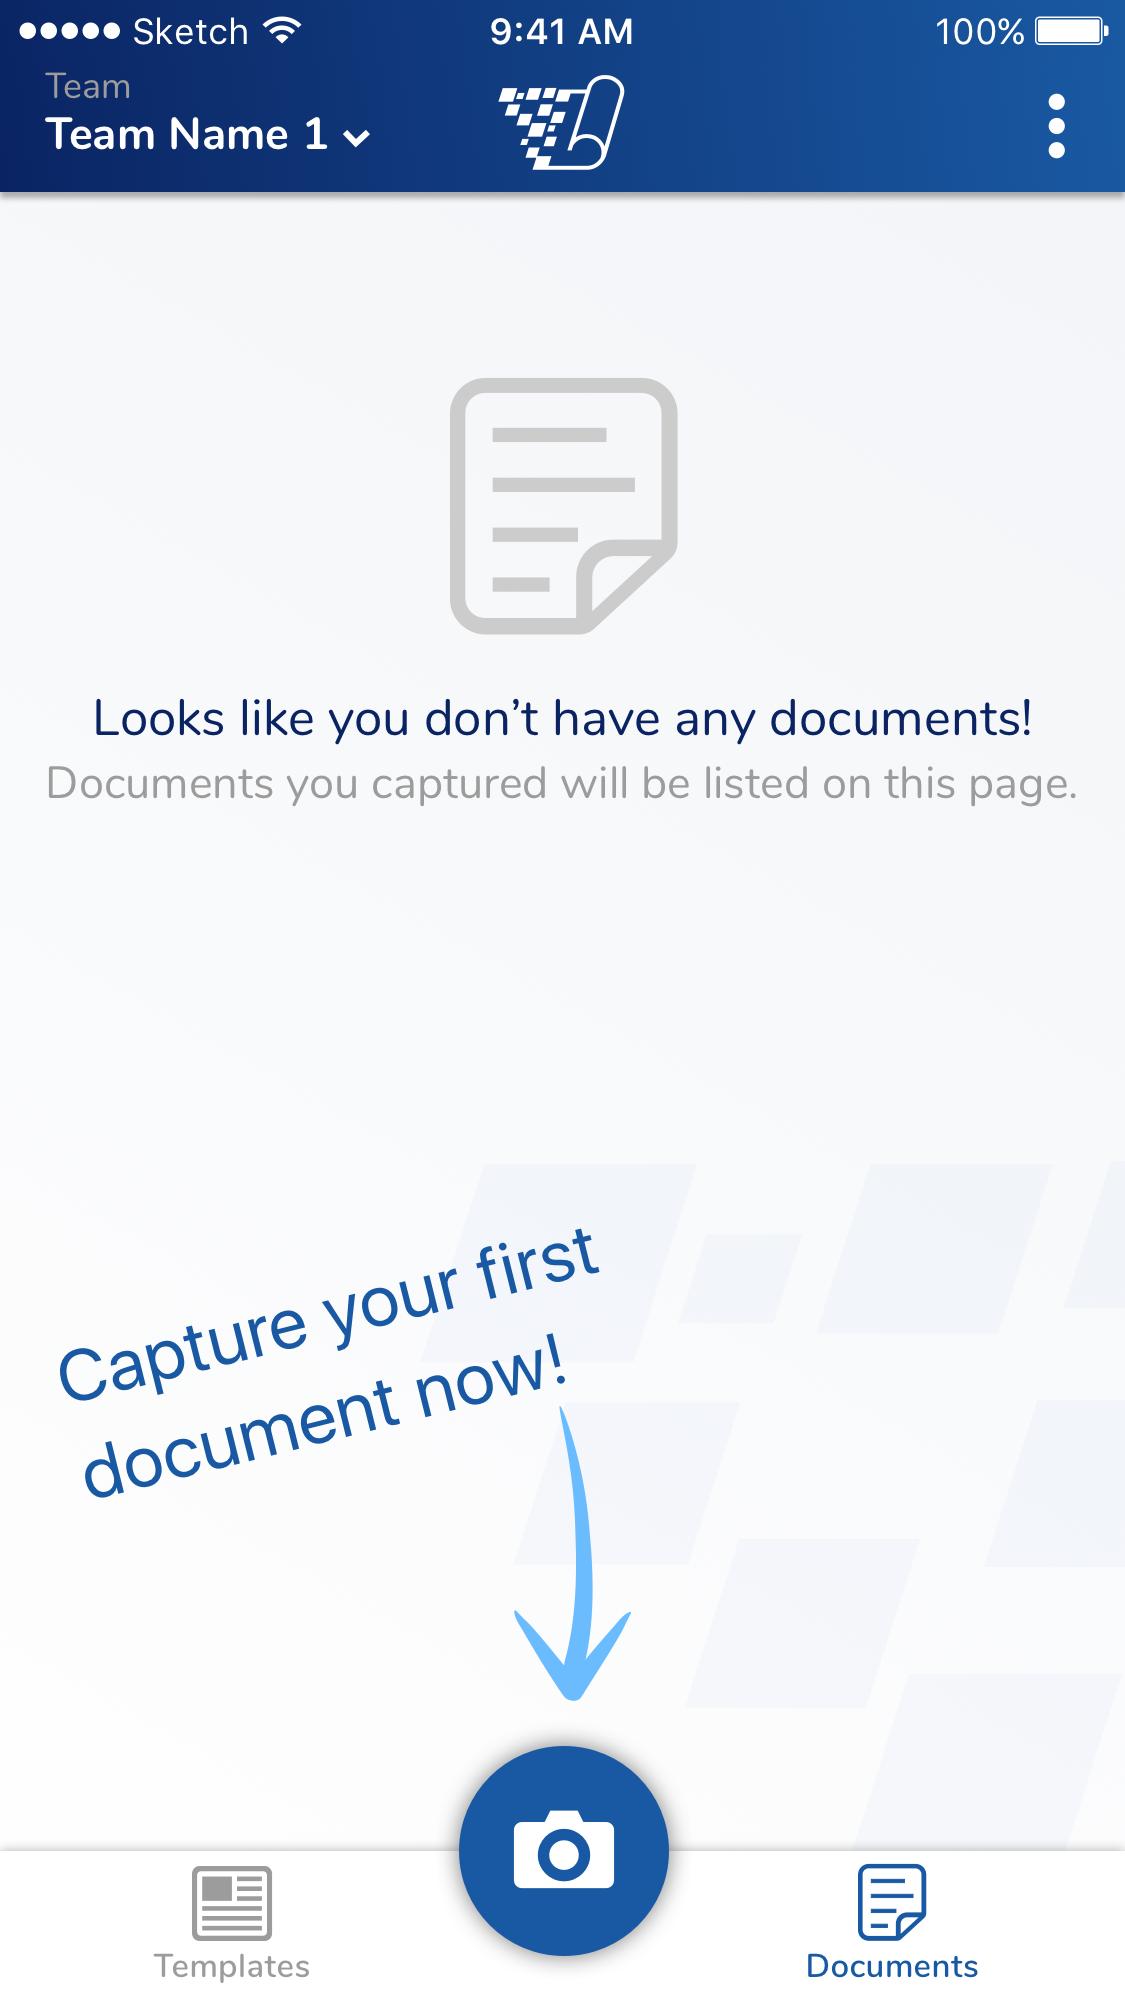 Capture 1st document